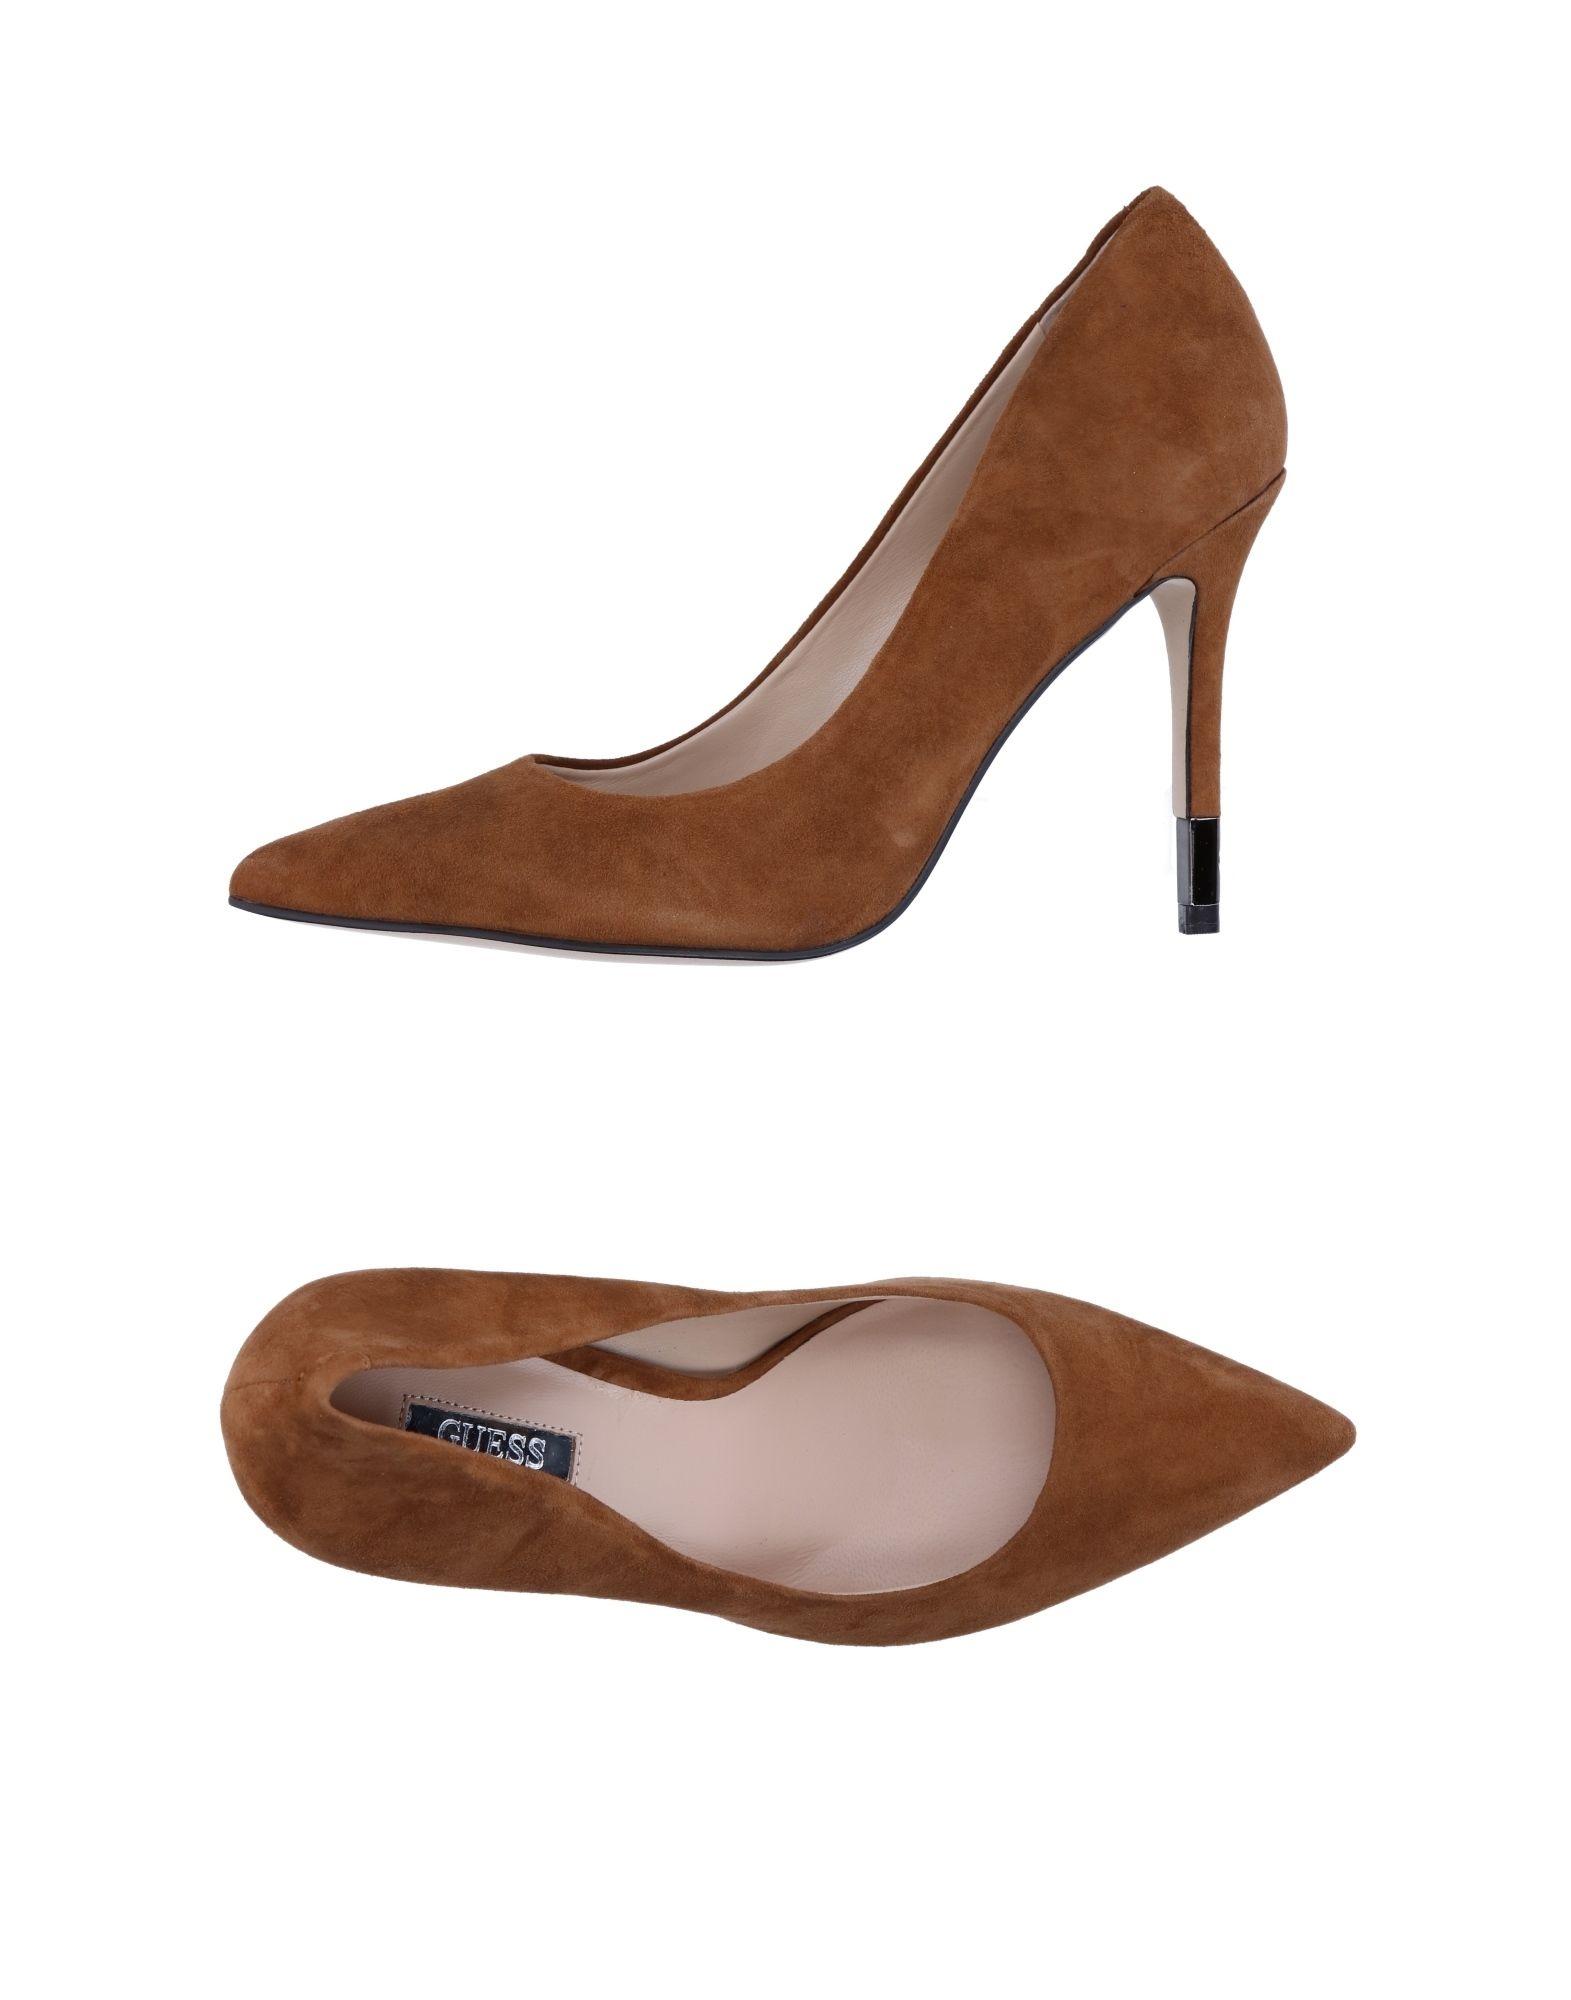 buy popular 188b6 e5b58 GUESS Pumps - Schuhe | YOOX.COM